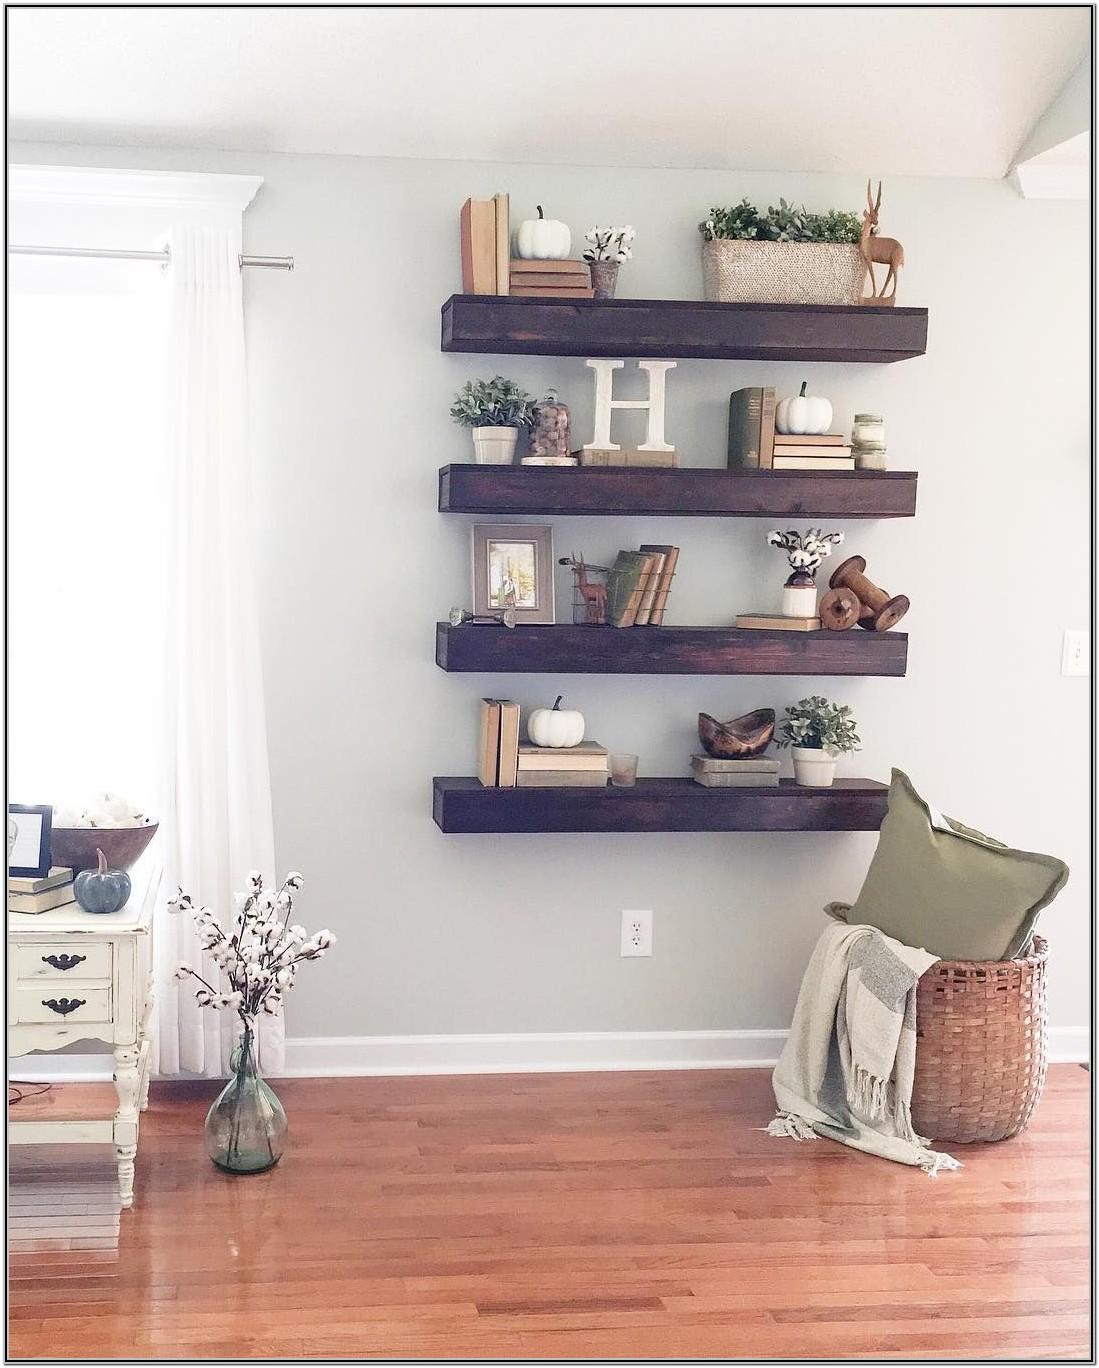 Living Room Wooden Wall Decor Shelves